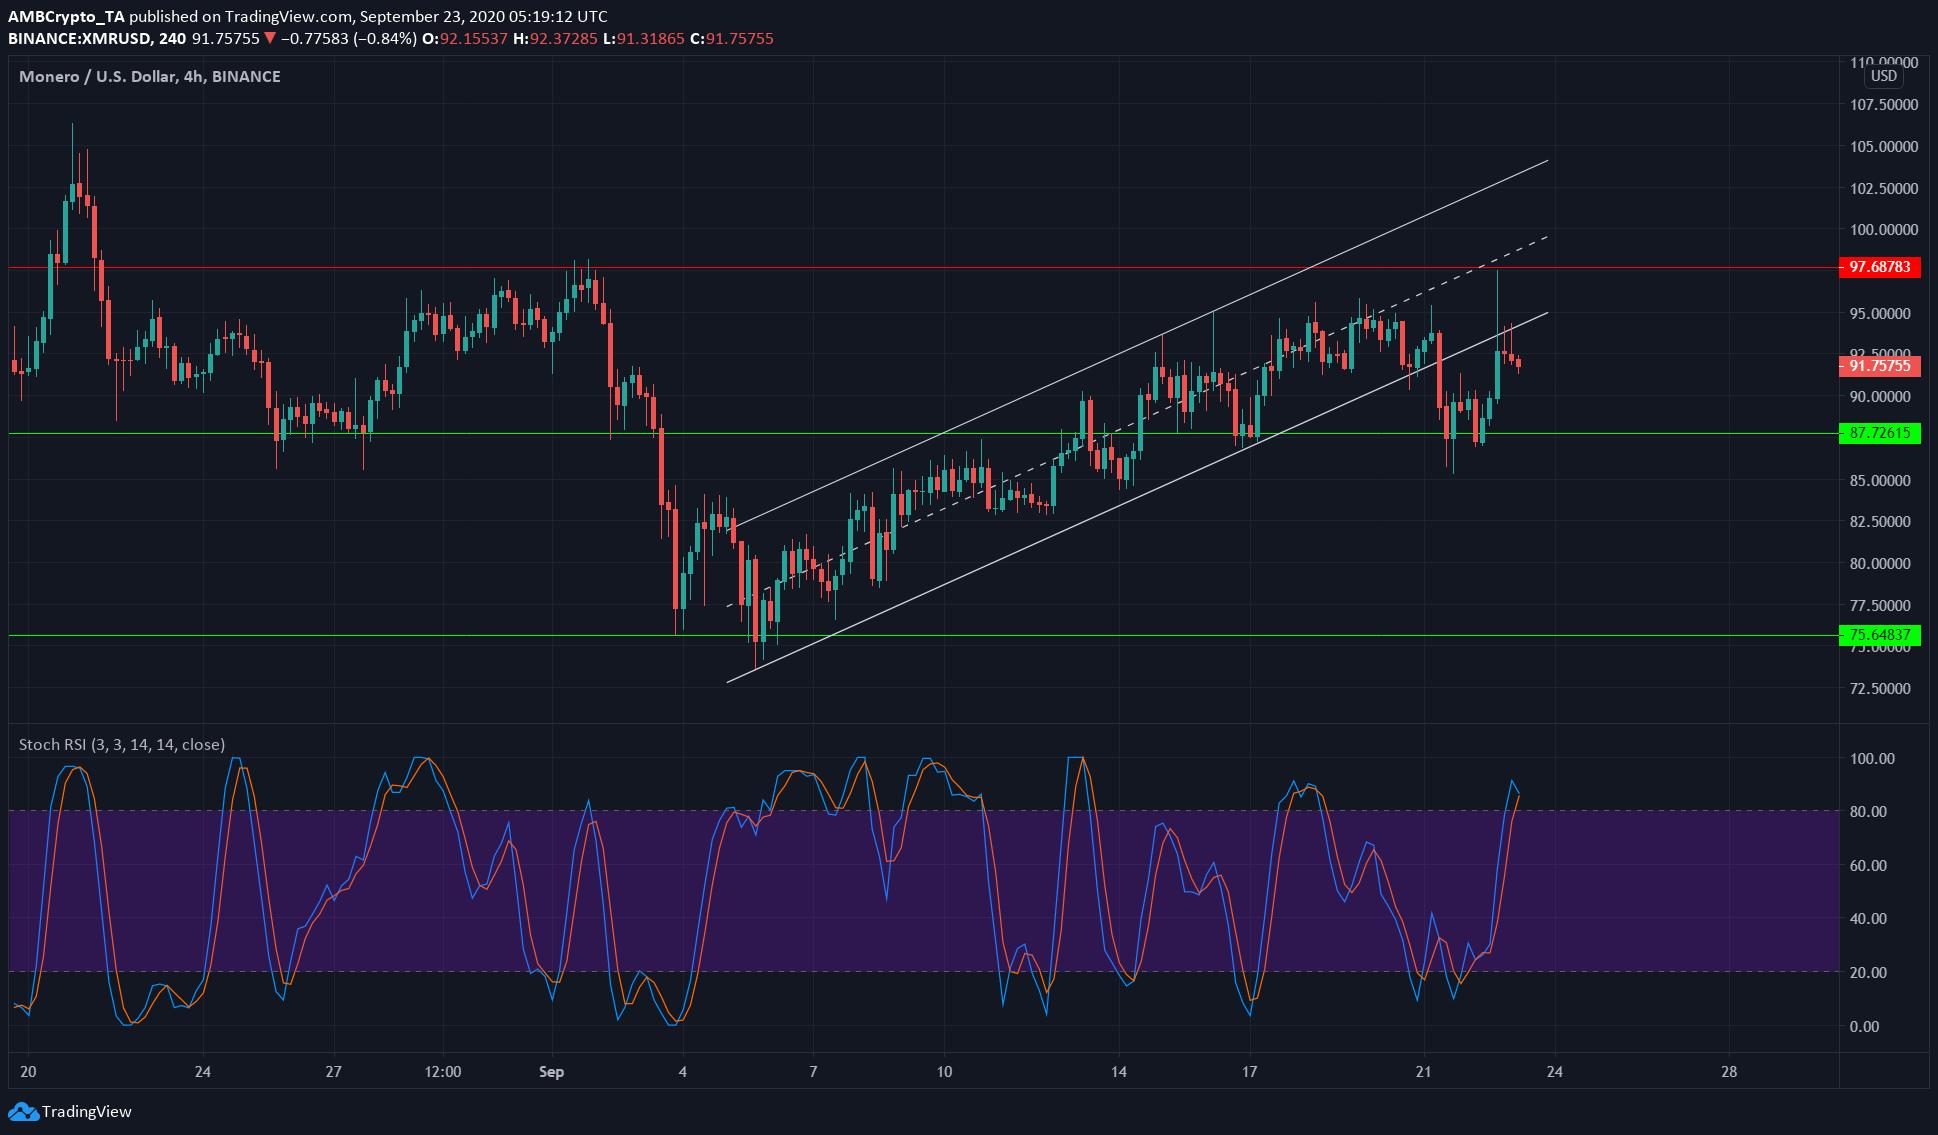 Bitcoin SV, Monero, BAT Price Analysis: 23 September